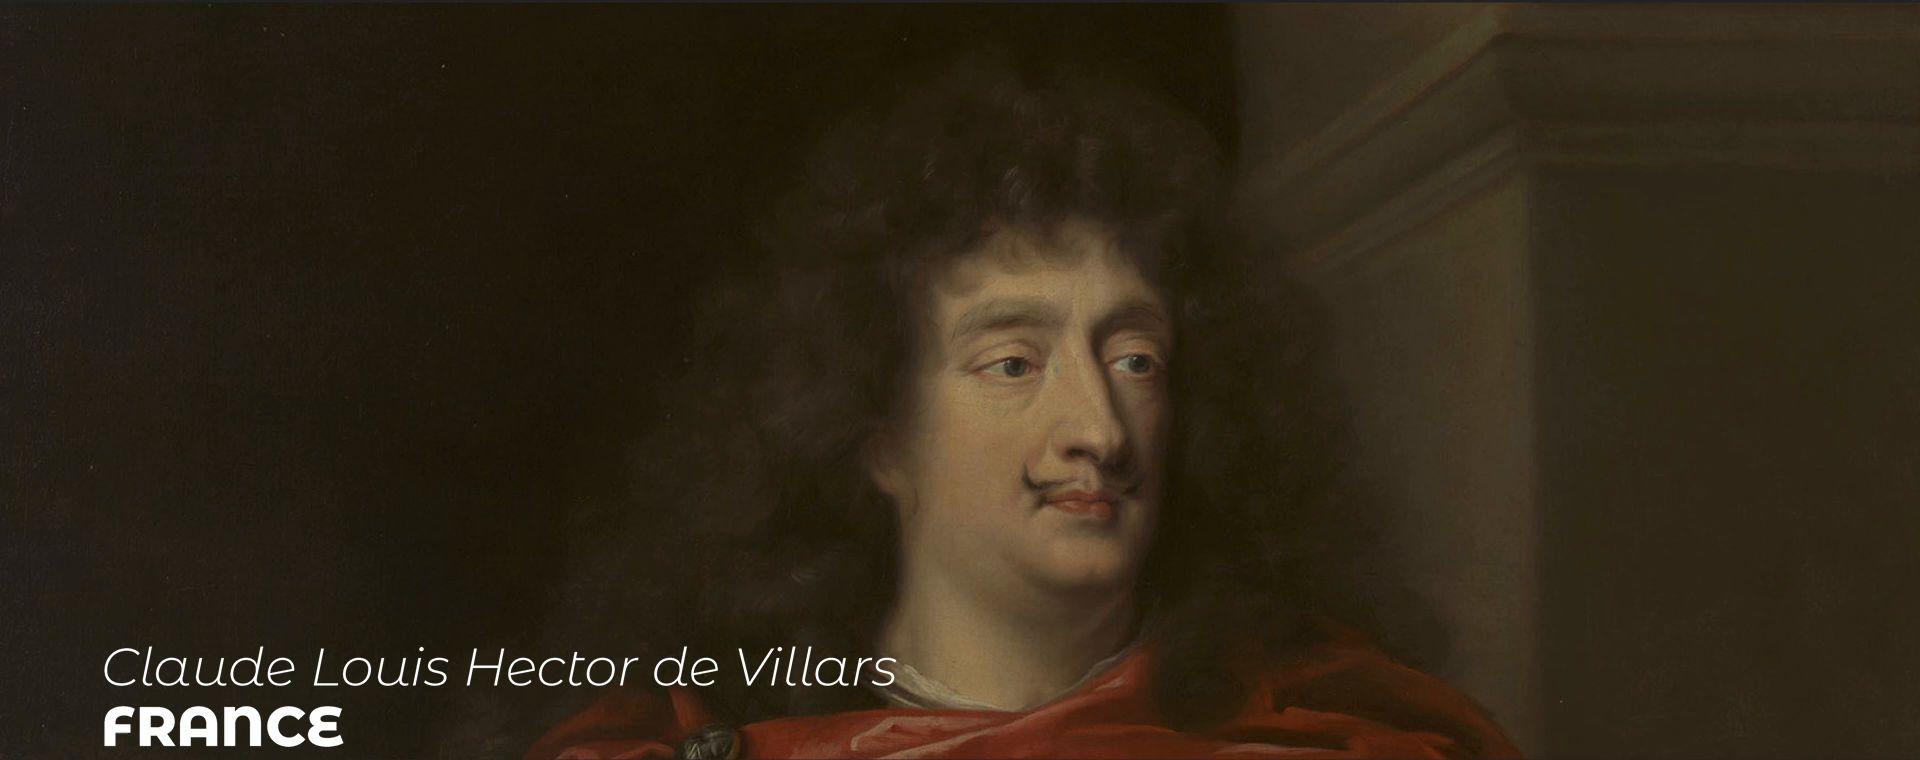 CLAUDE LOUIS HECTOR DE VILLARS